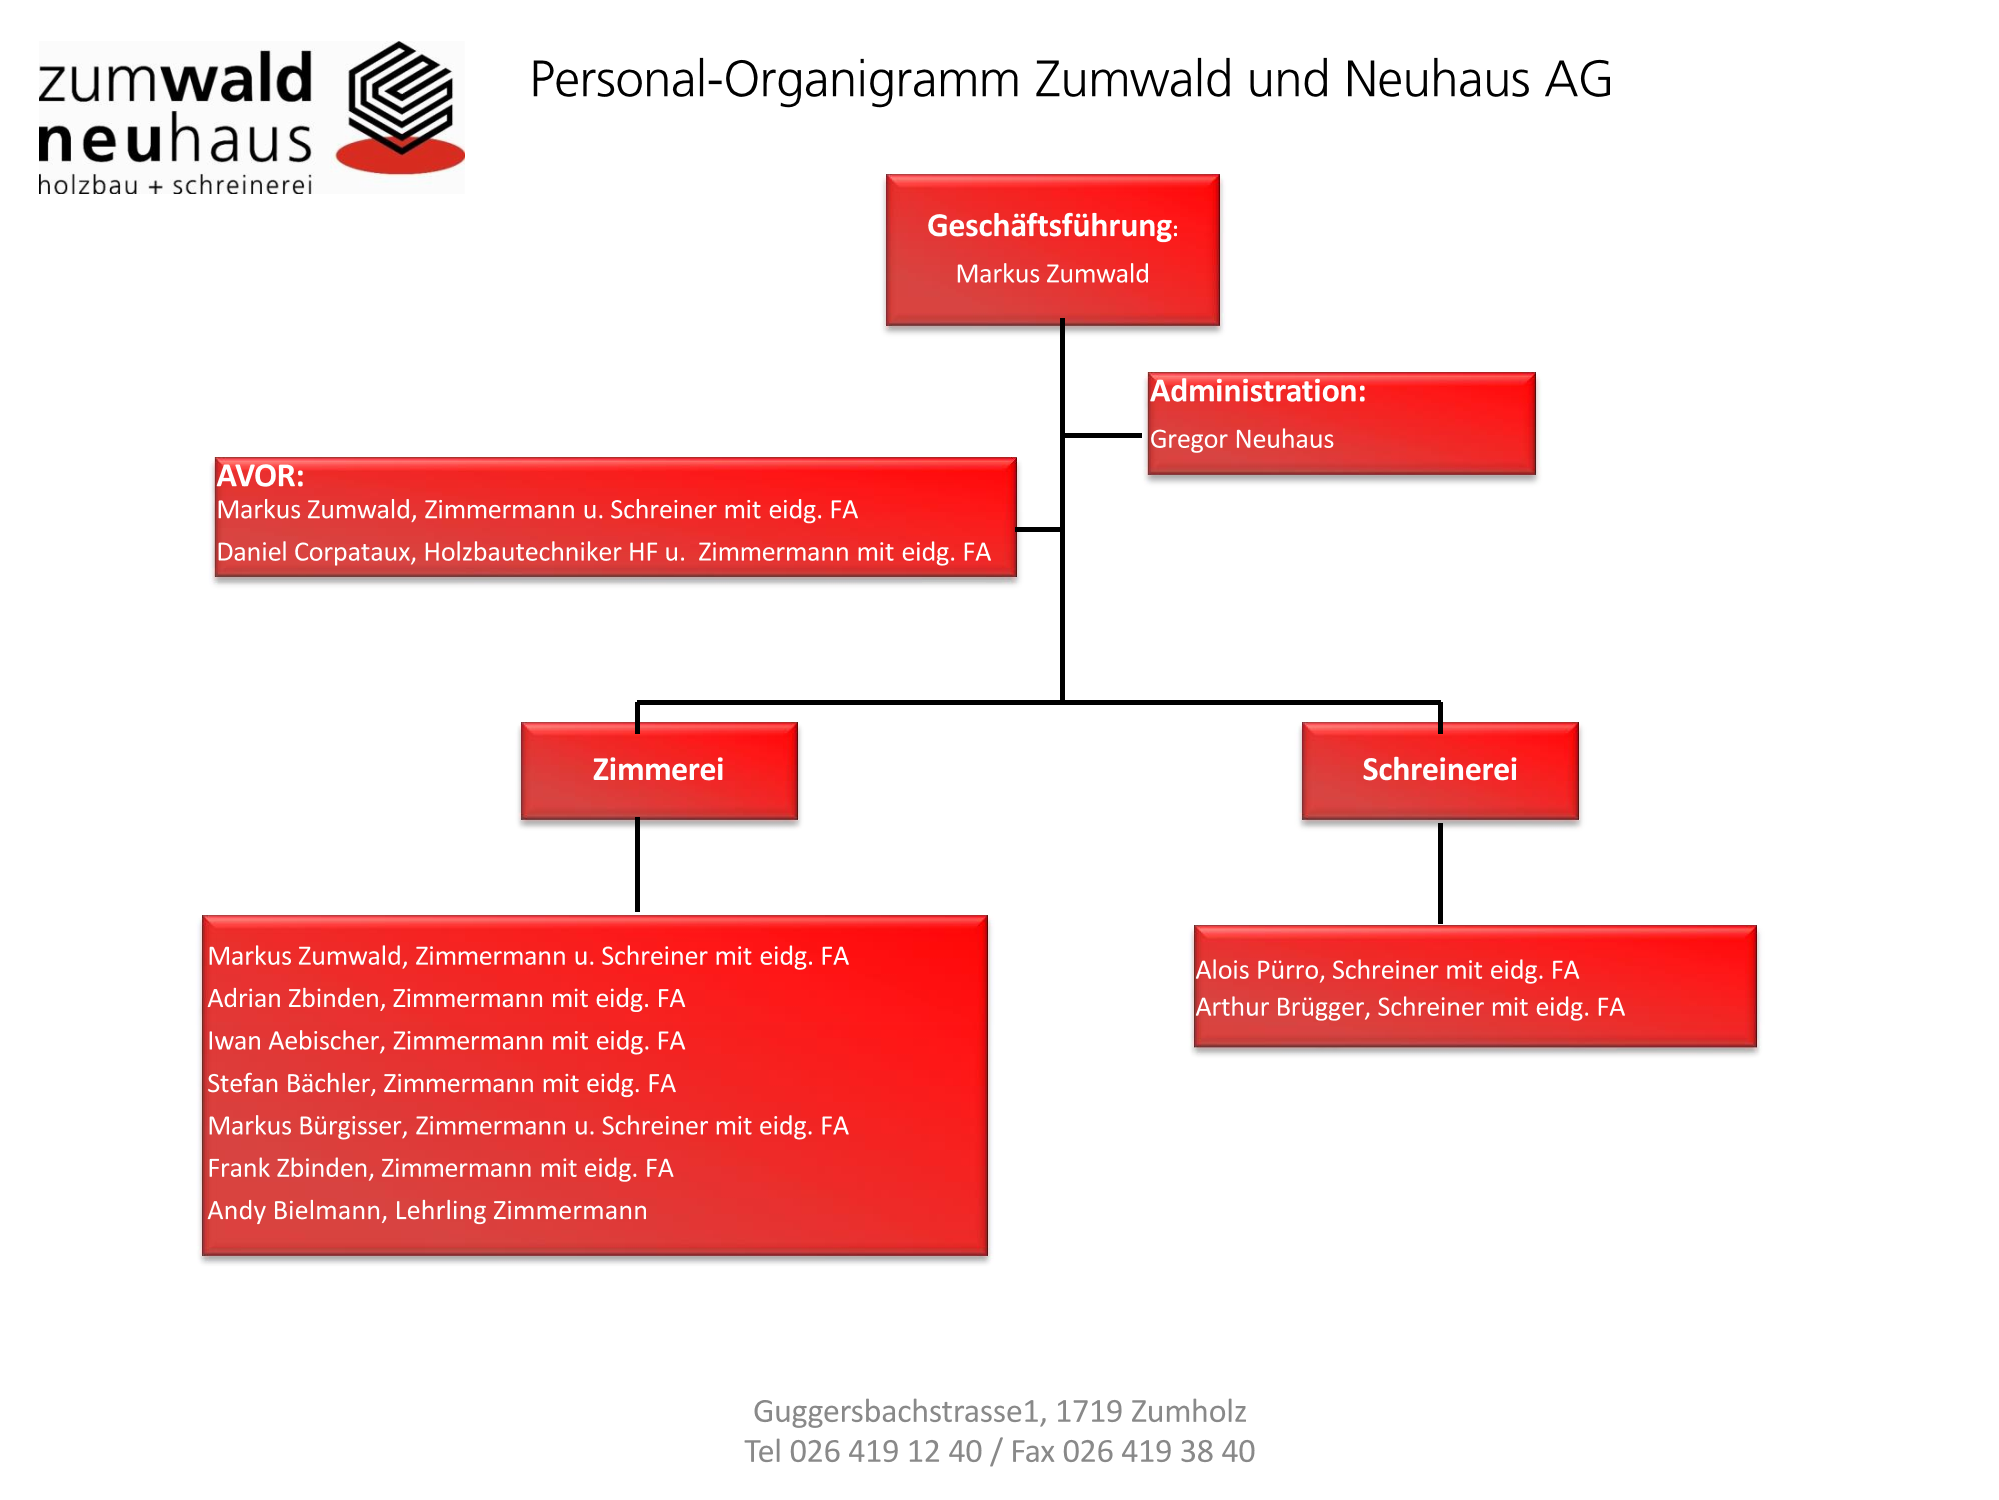 personal-organigramm_2016_page_1